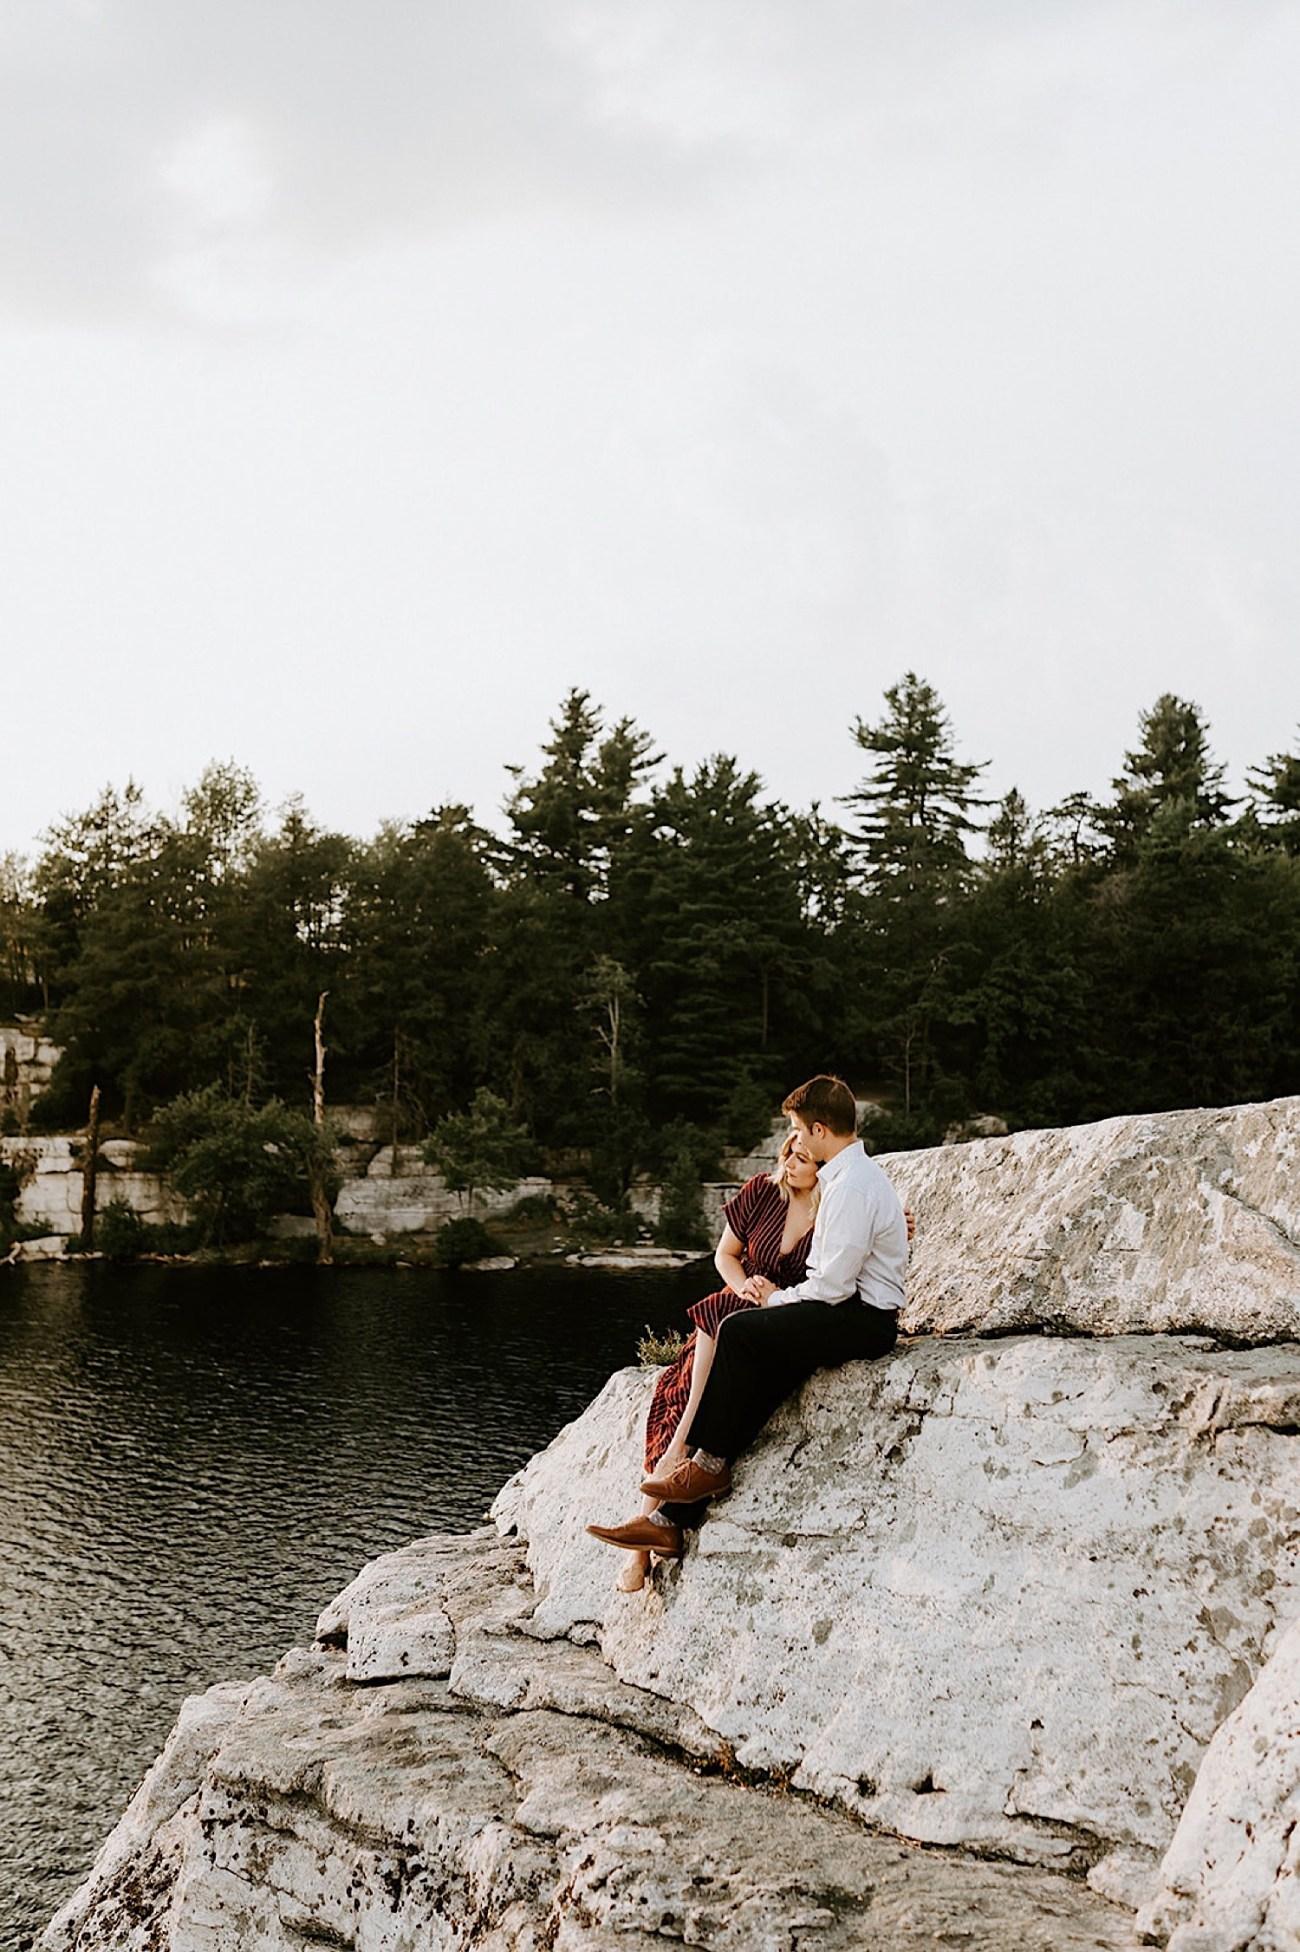 043 Minnewaska State Park Engagement Photos Minnewaska Enagement New York Wedding Photographer Catskill Wedding Photographer Hudson Valley Wedding Photographer